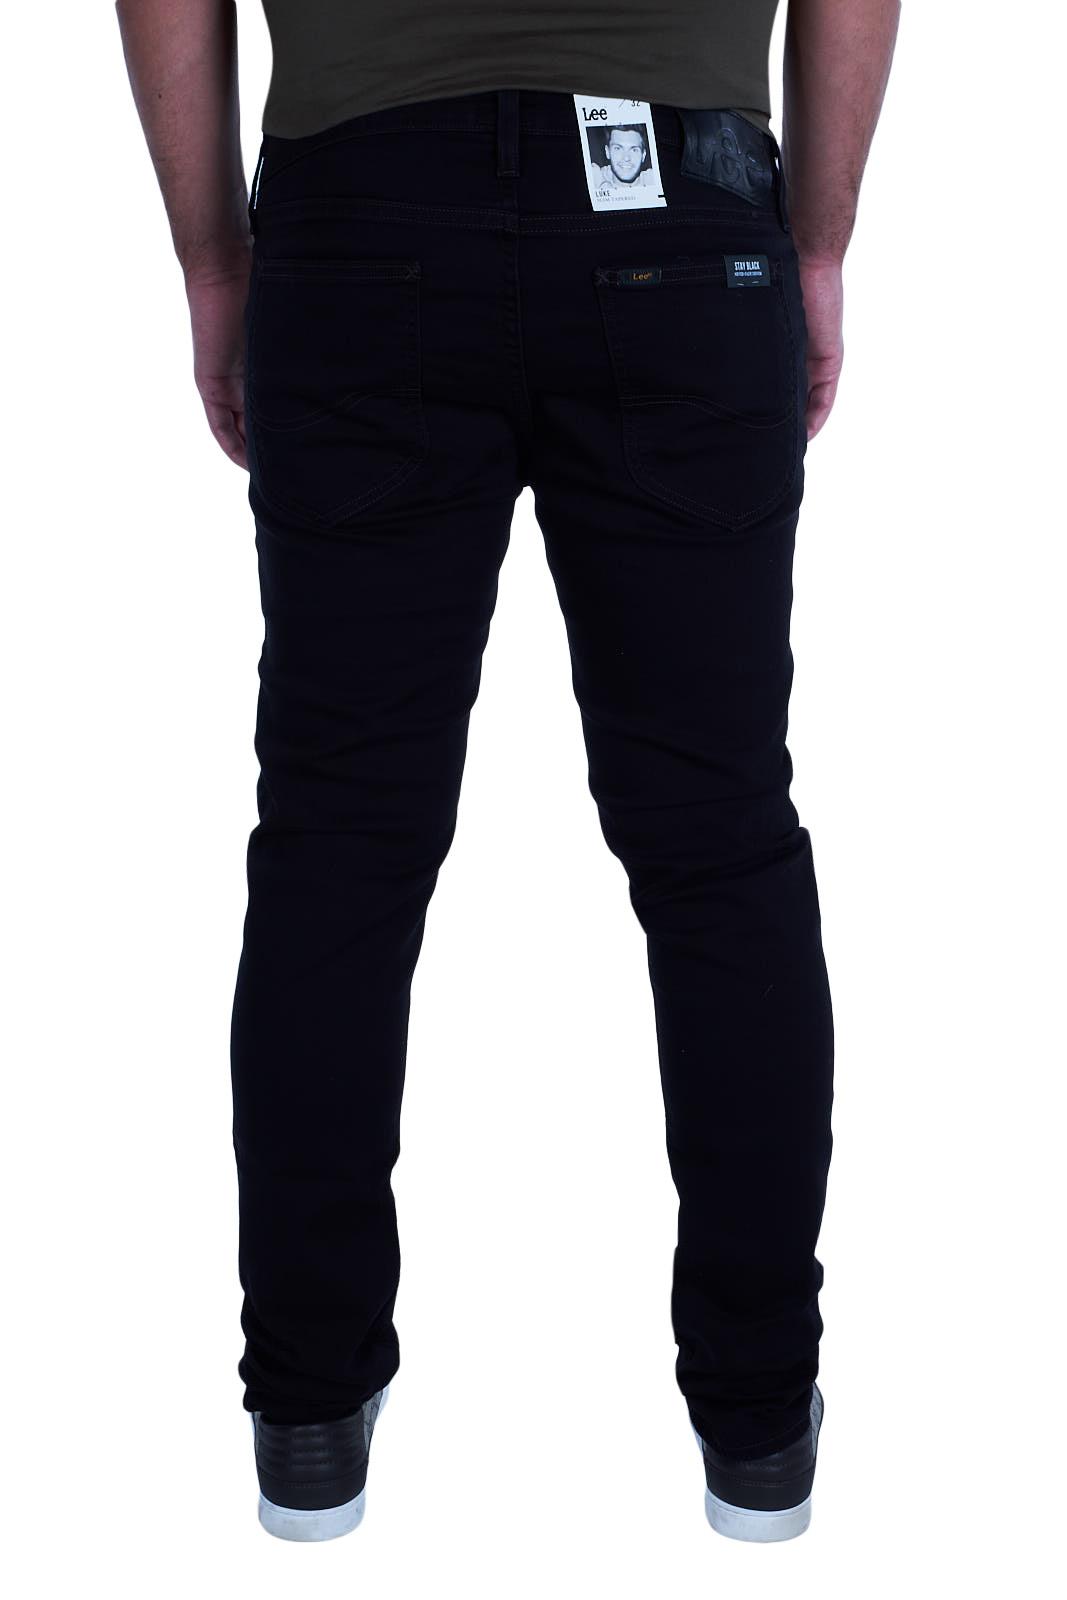 LEE Herren Herren Herren Jeans Luke Slimfit Designer Hose ultimativer Slim Taperot Fit L719 | Verbraucher zuerst  0768d1